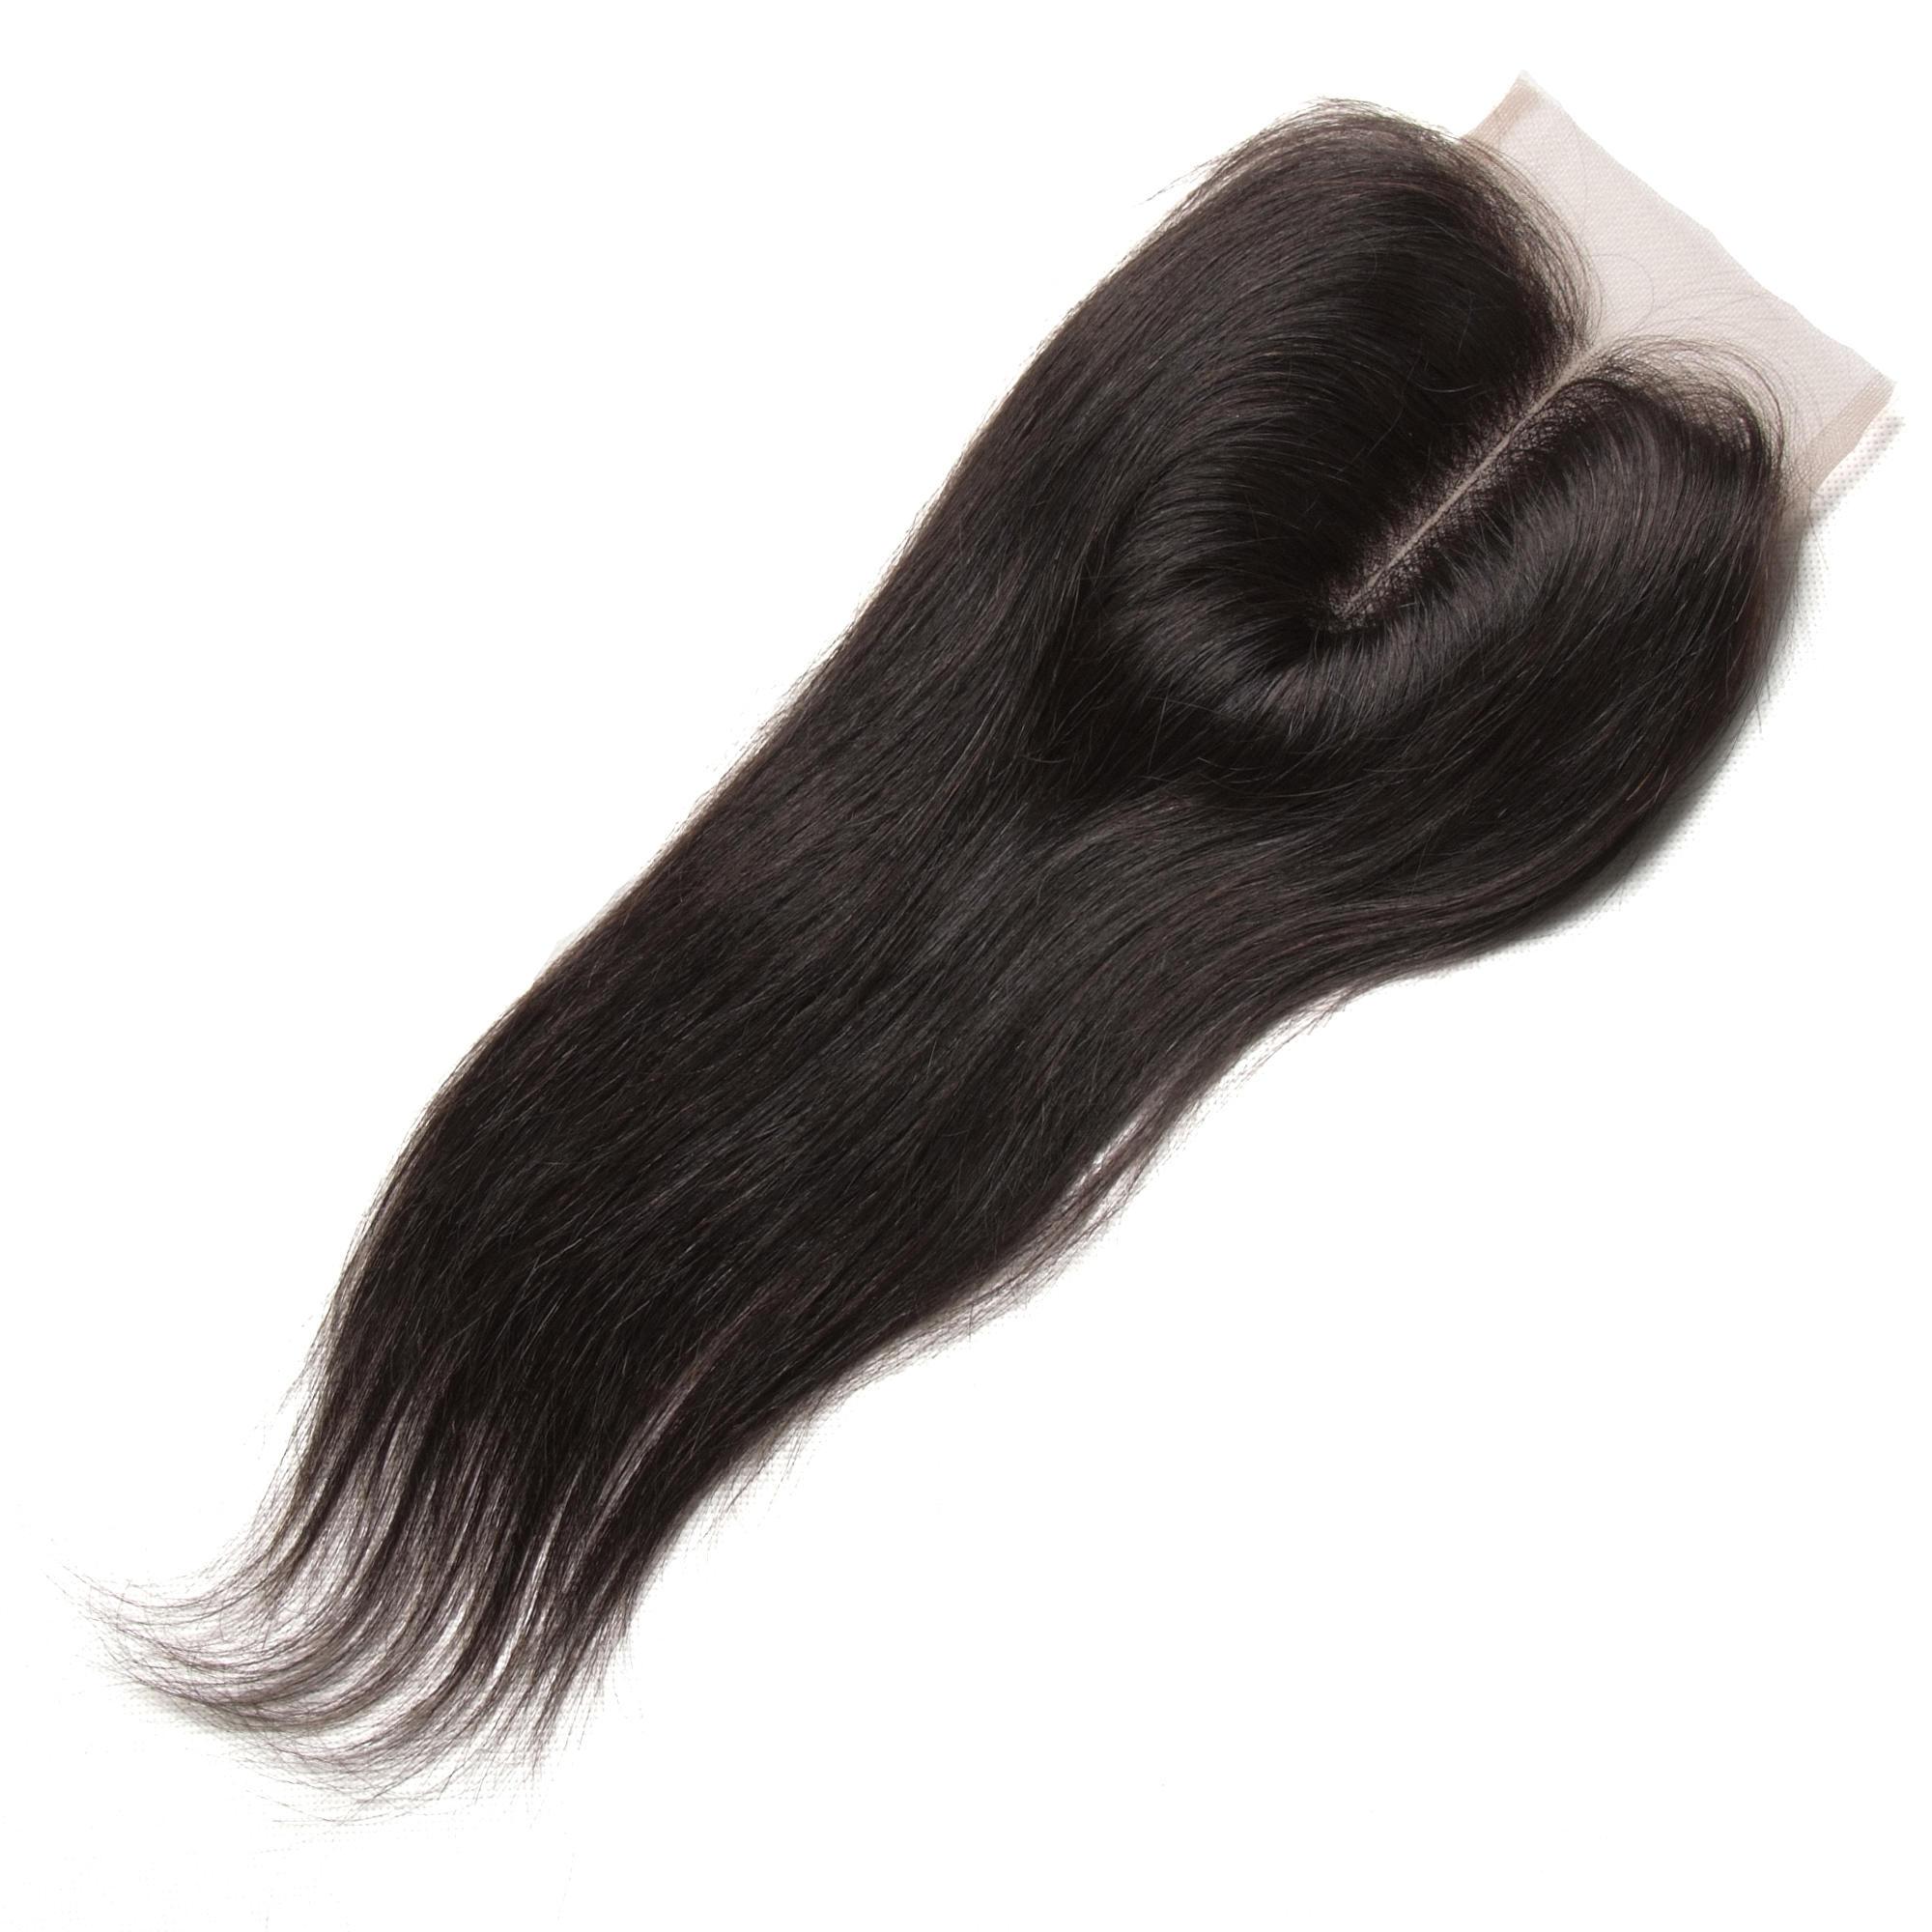 UNice Hair image 27